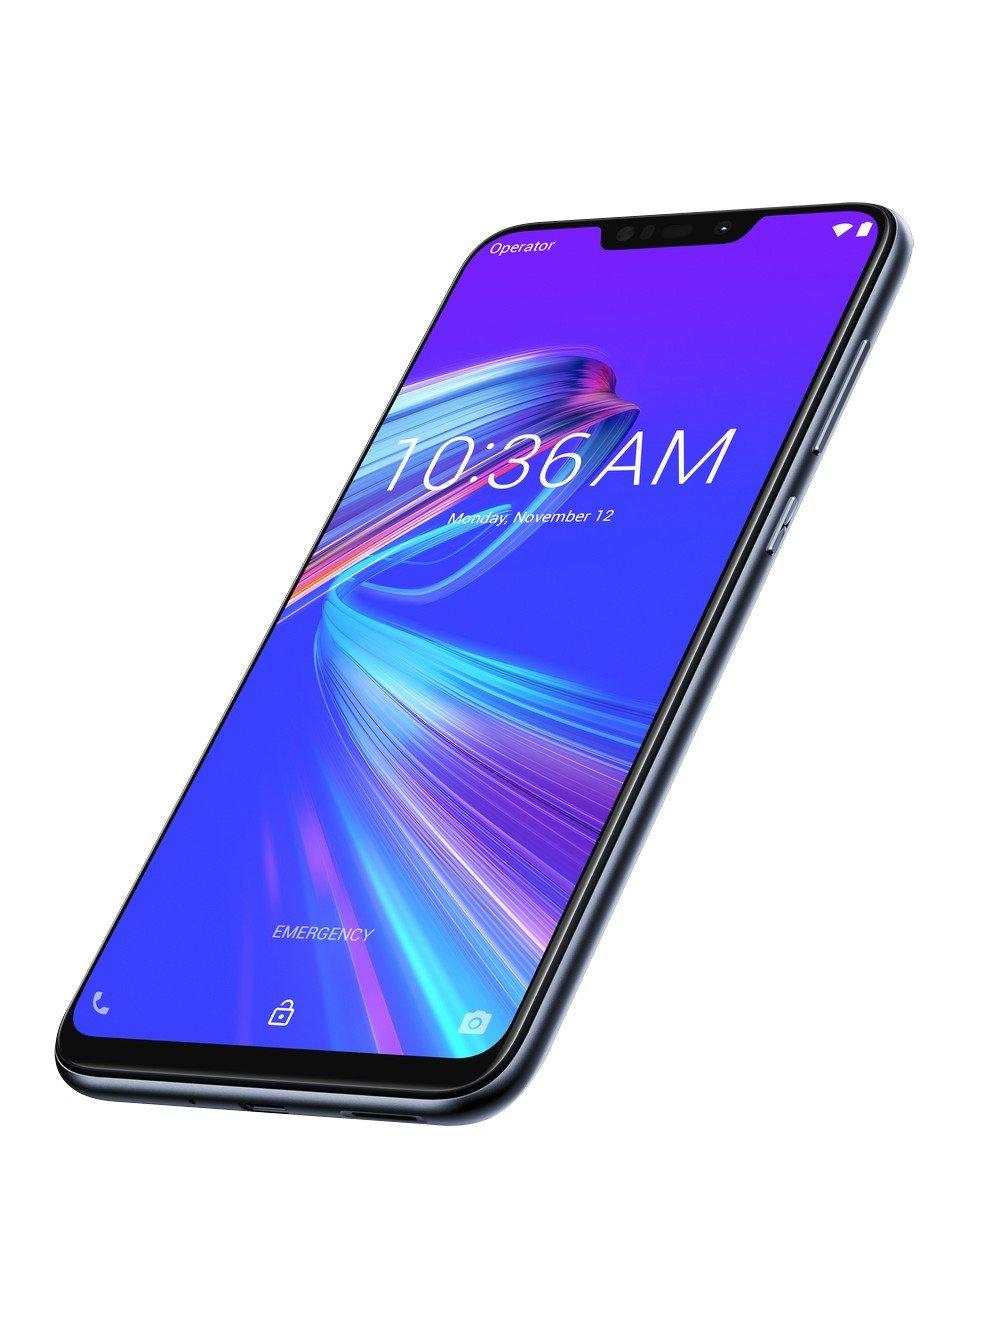 Смартфон Asus ZenFone Max (M2) (ZB633KL-4A070EU) 4/32 GB DUALSIM Black с чехлом фото 5